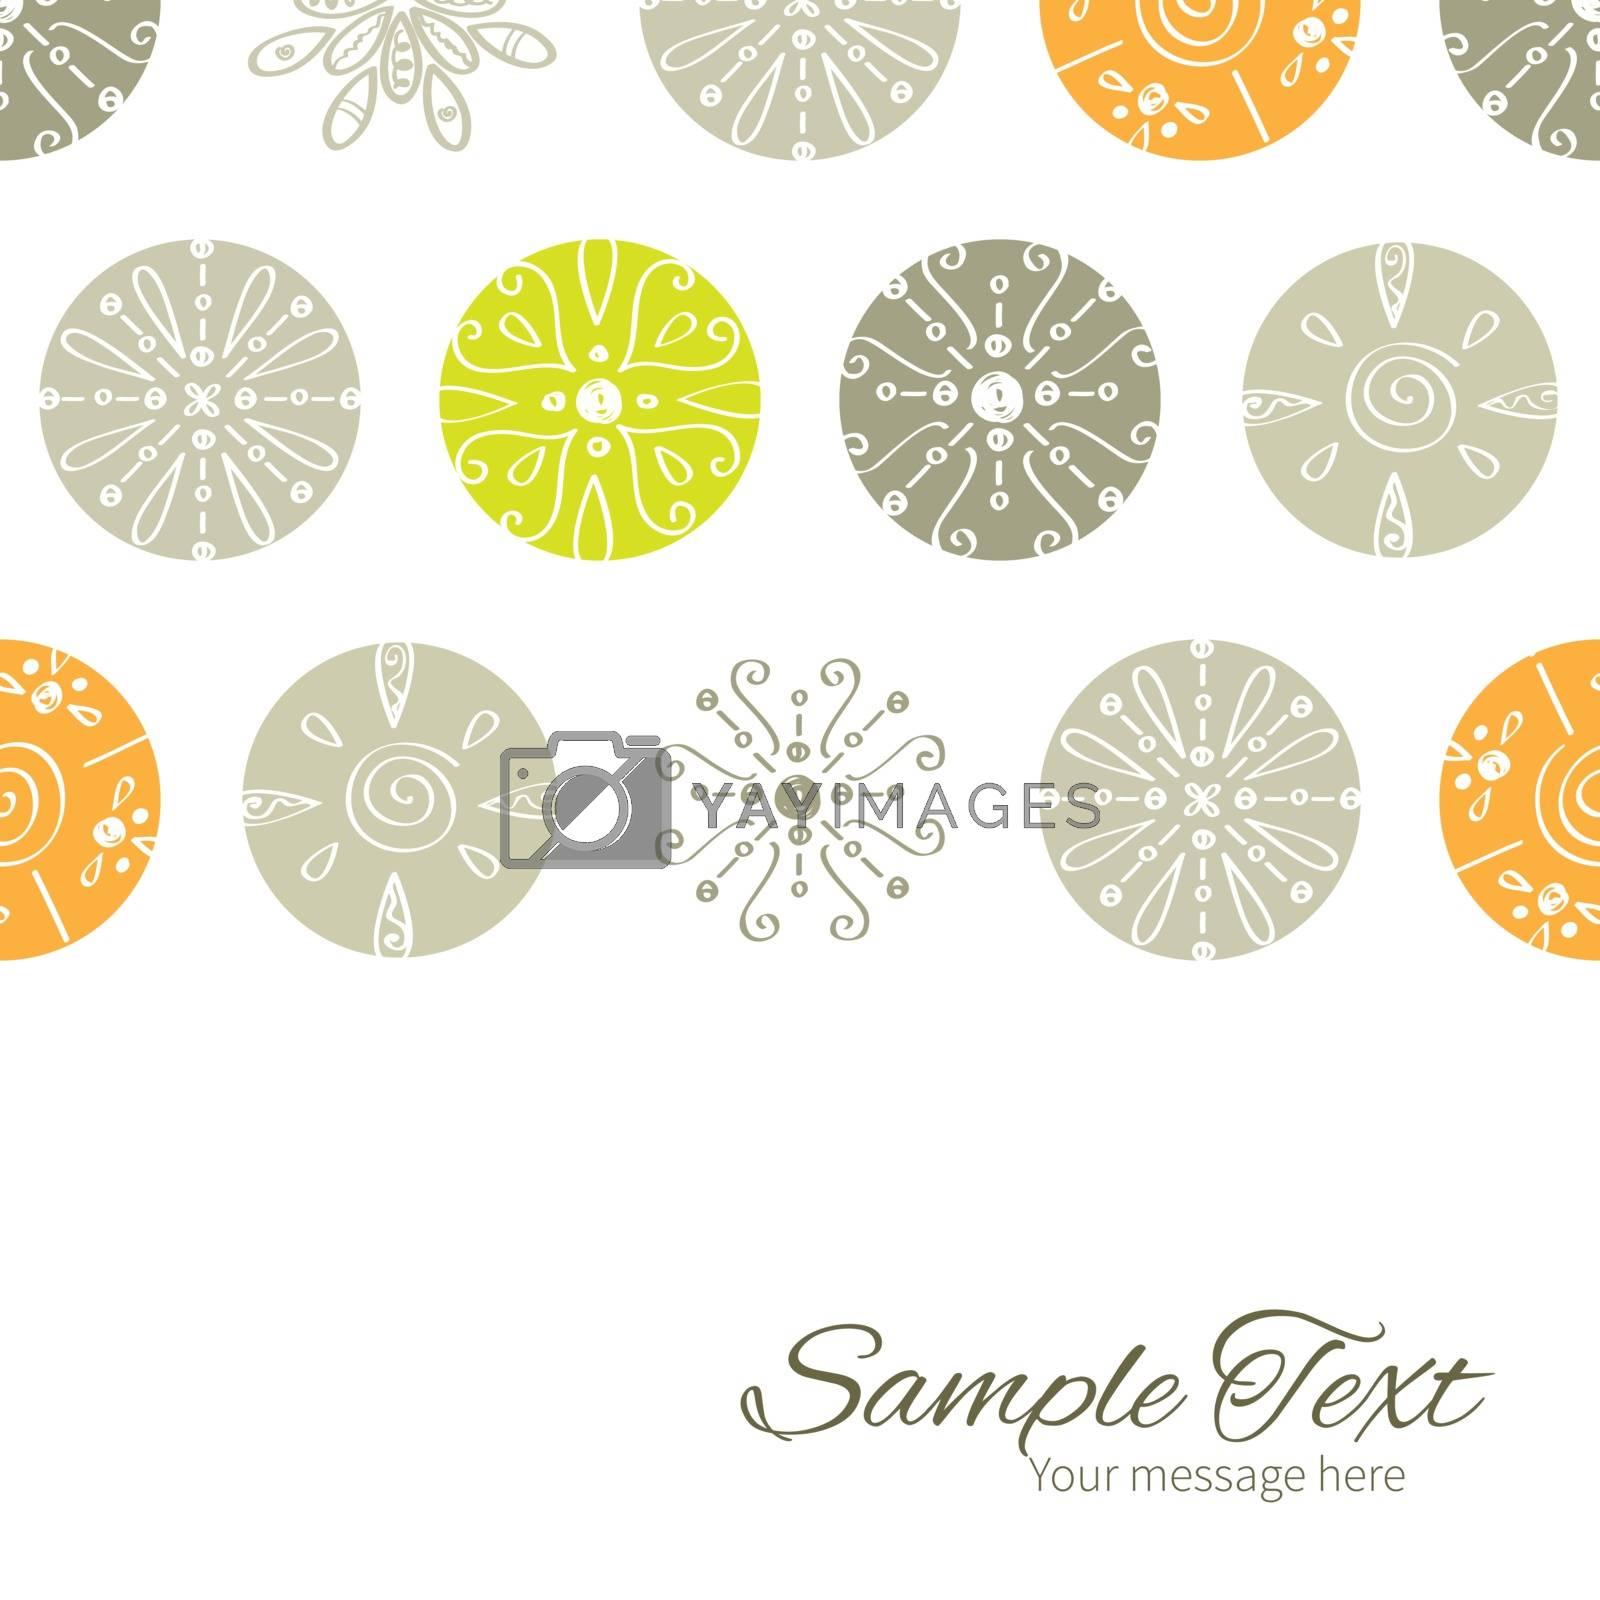 Vector abstract gray and green polka dot backgr horizontal border card template graphic design